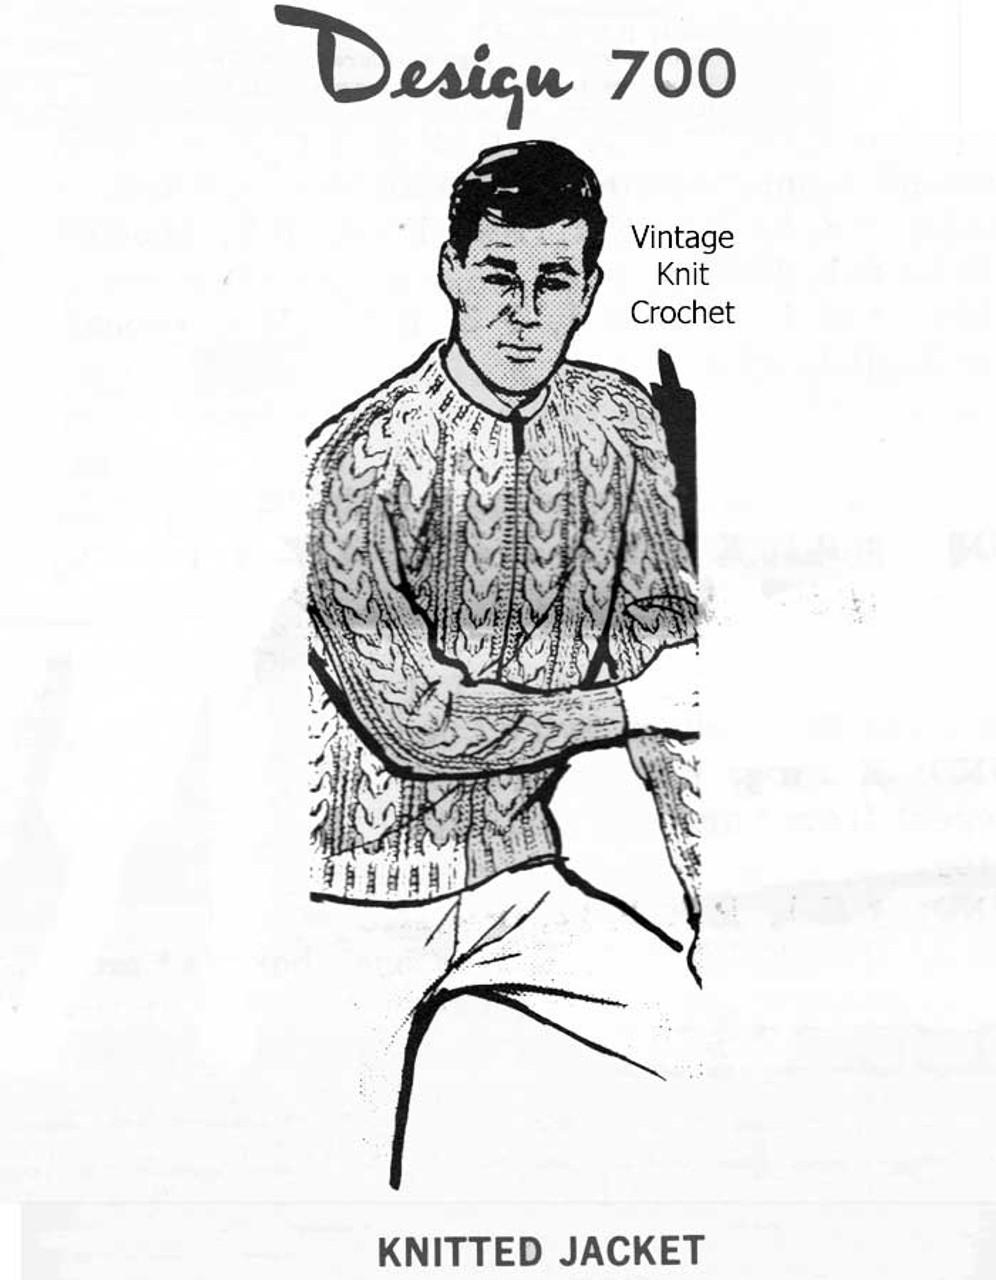 Mens Cable Jacket Knitting Pattern, Laura wheeler Design 700